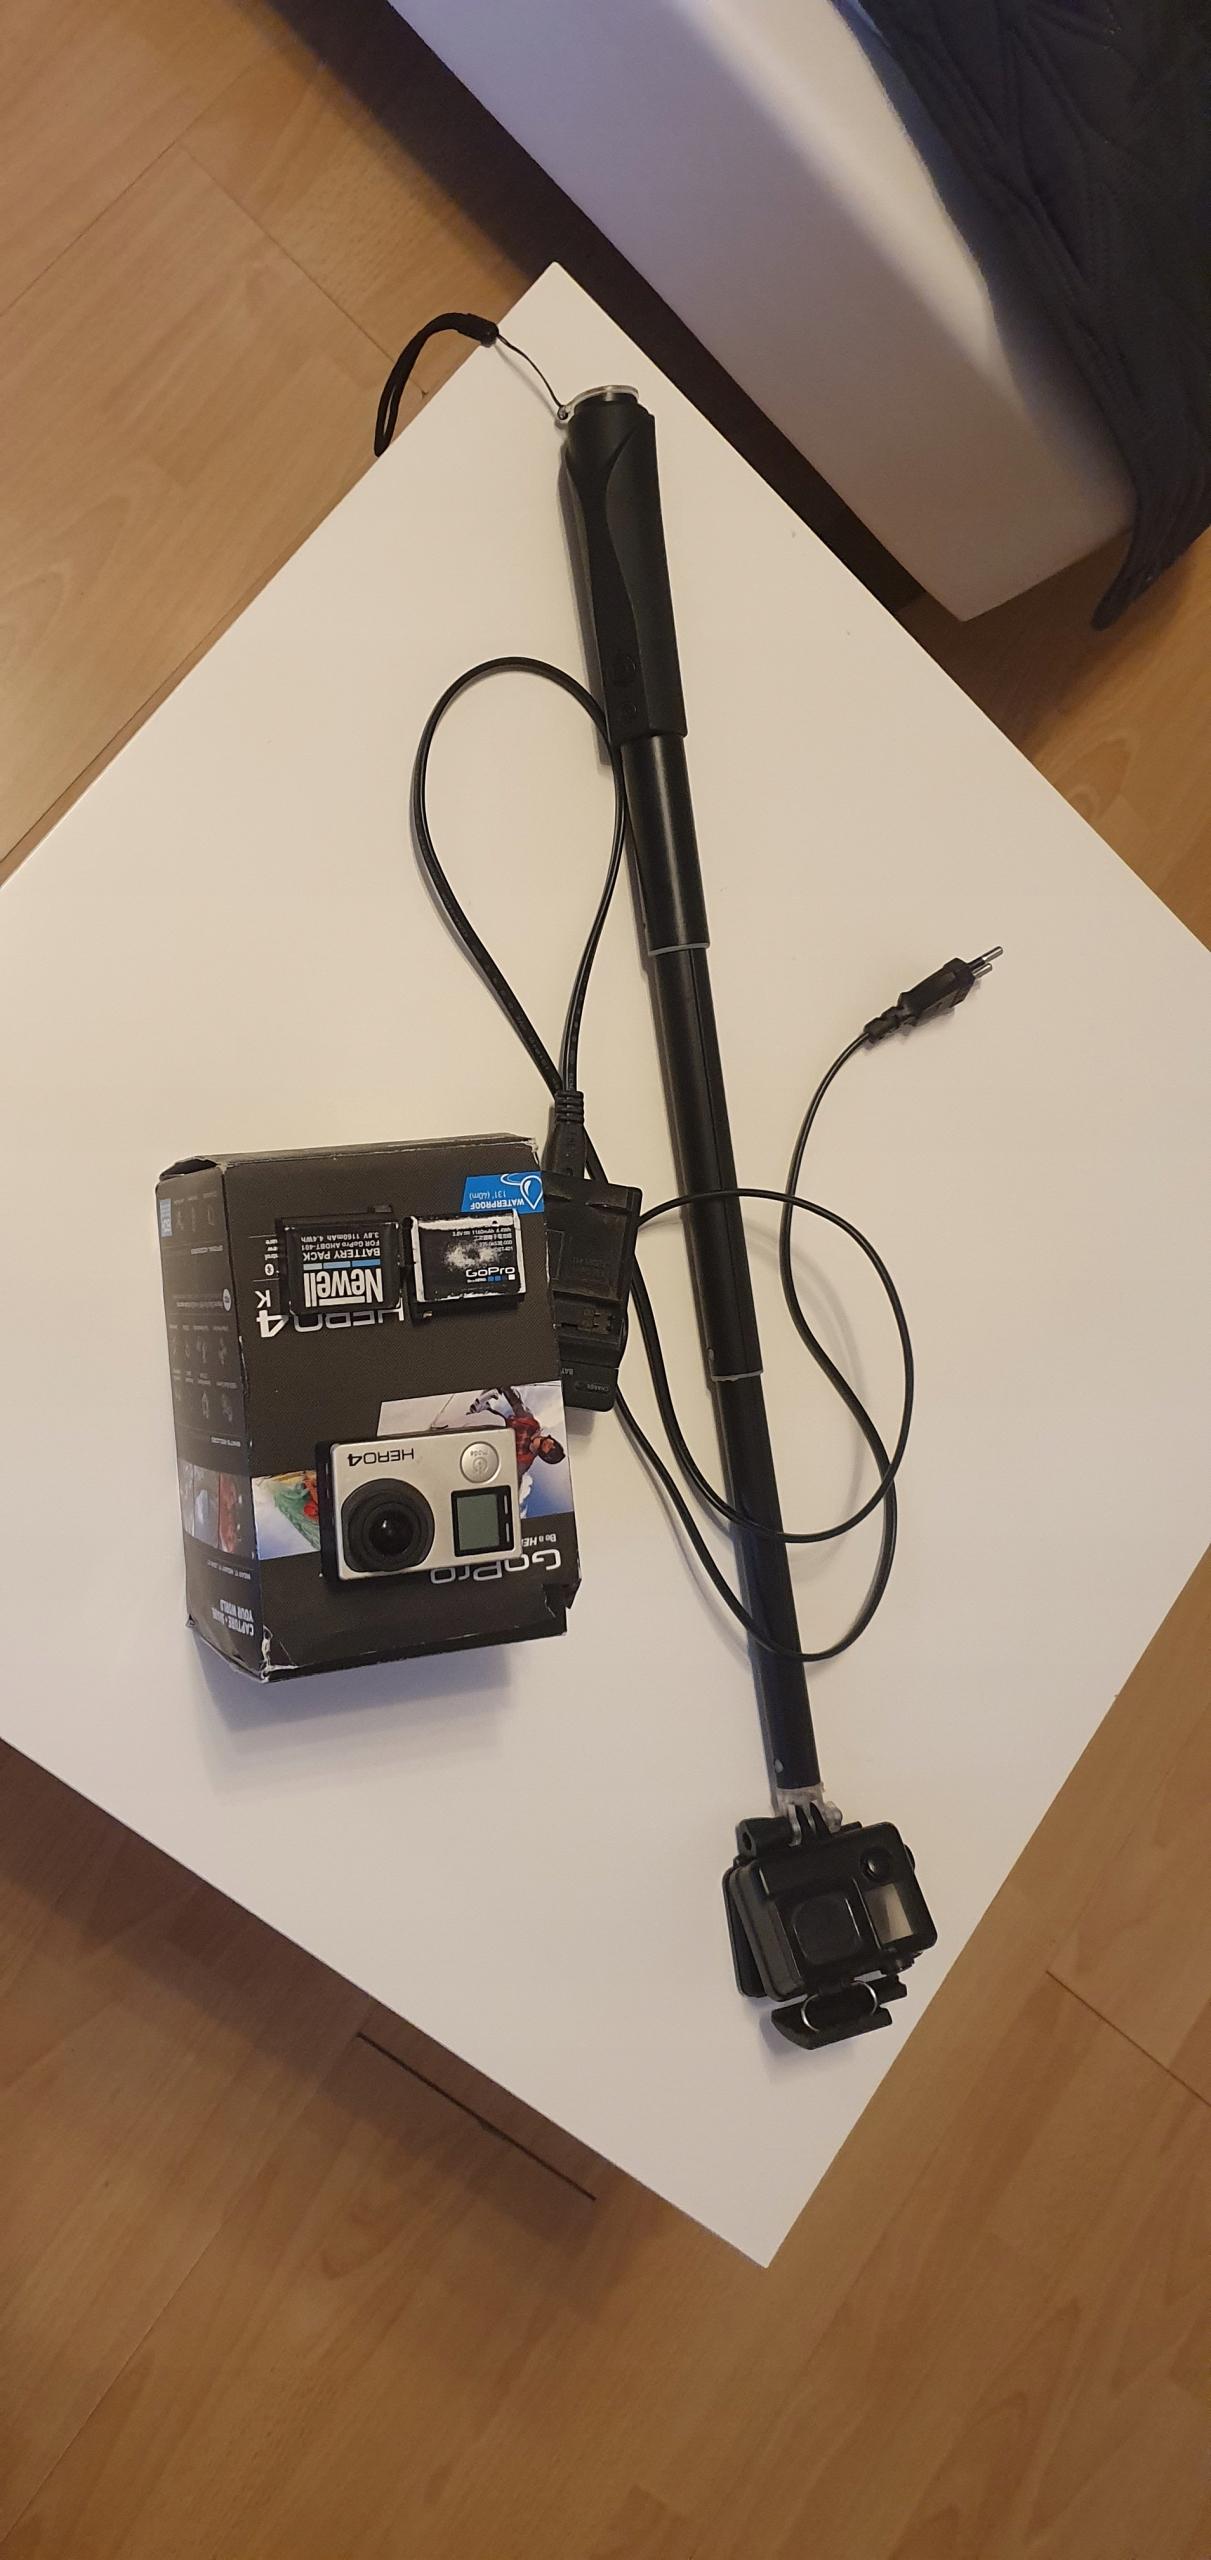 GoPro Hero 4 Black 16 GB dwie baterie i inne bdb